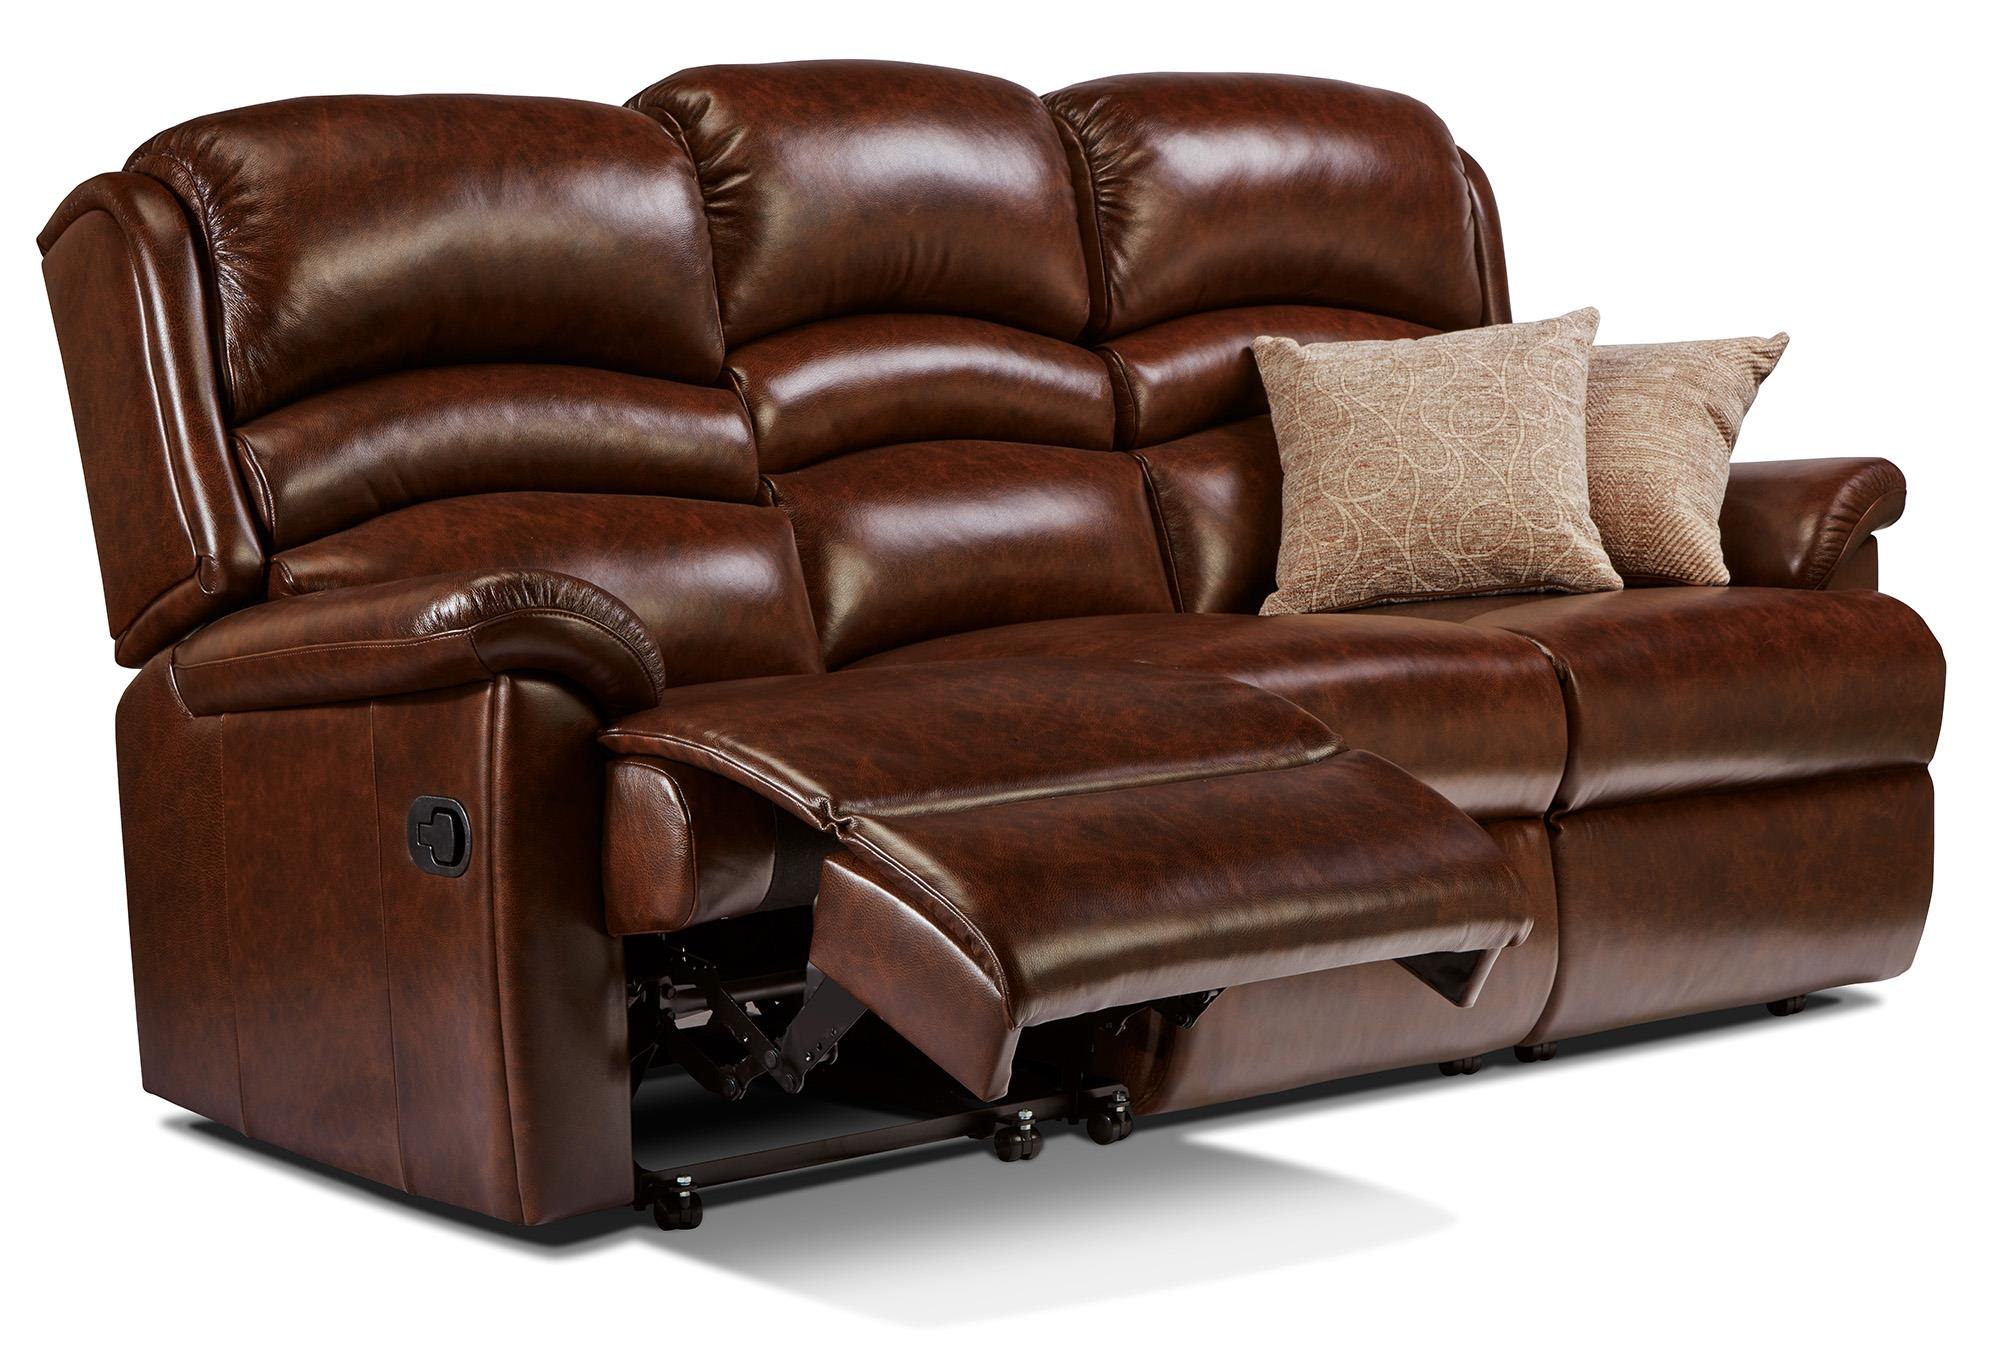 OLIVIA - Leather Reclining 3 Seat Settee